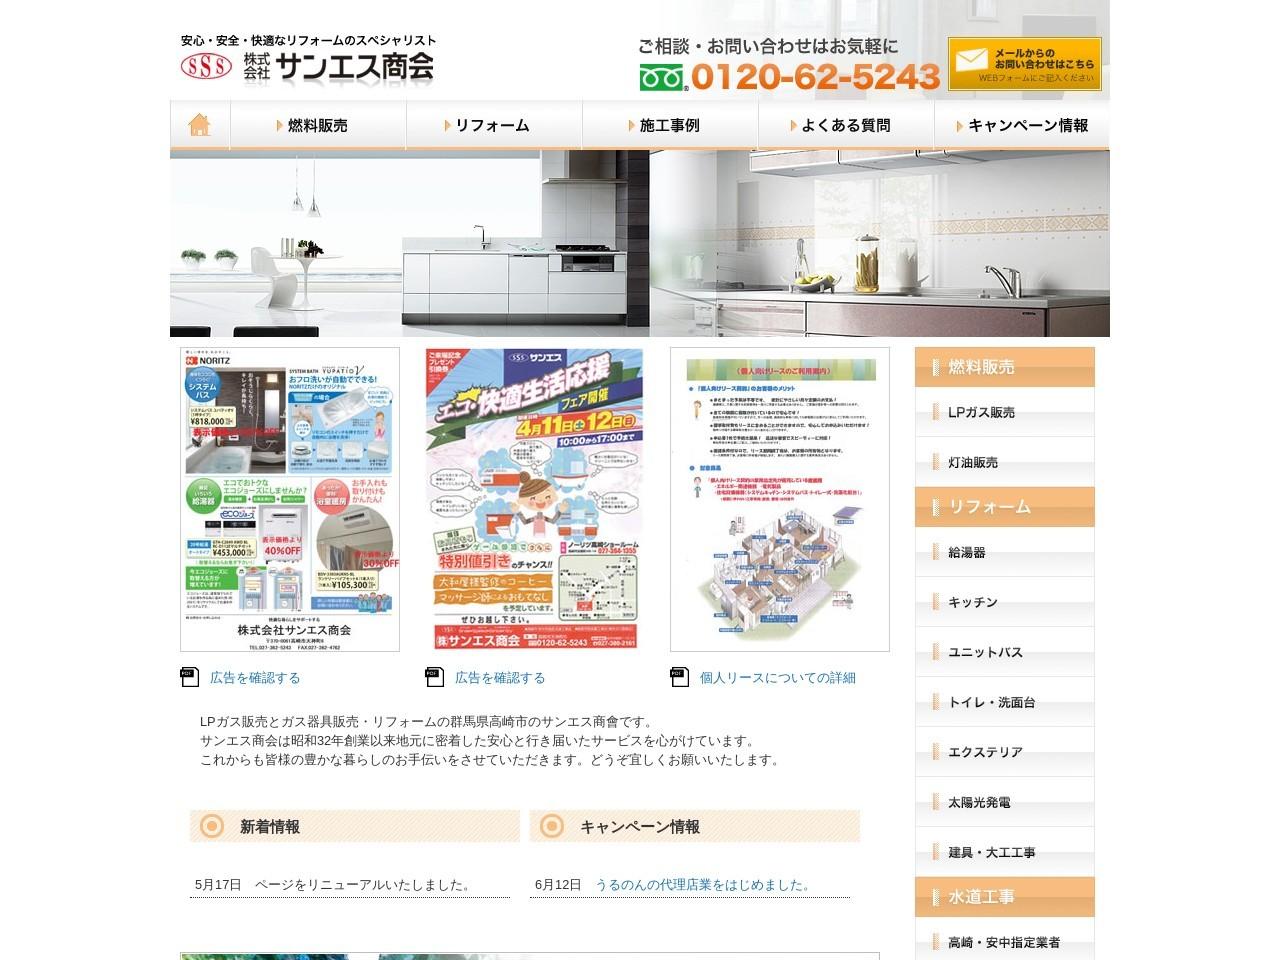 株式会社サンエス商会安中営業所